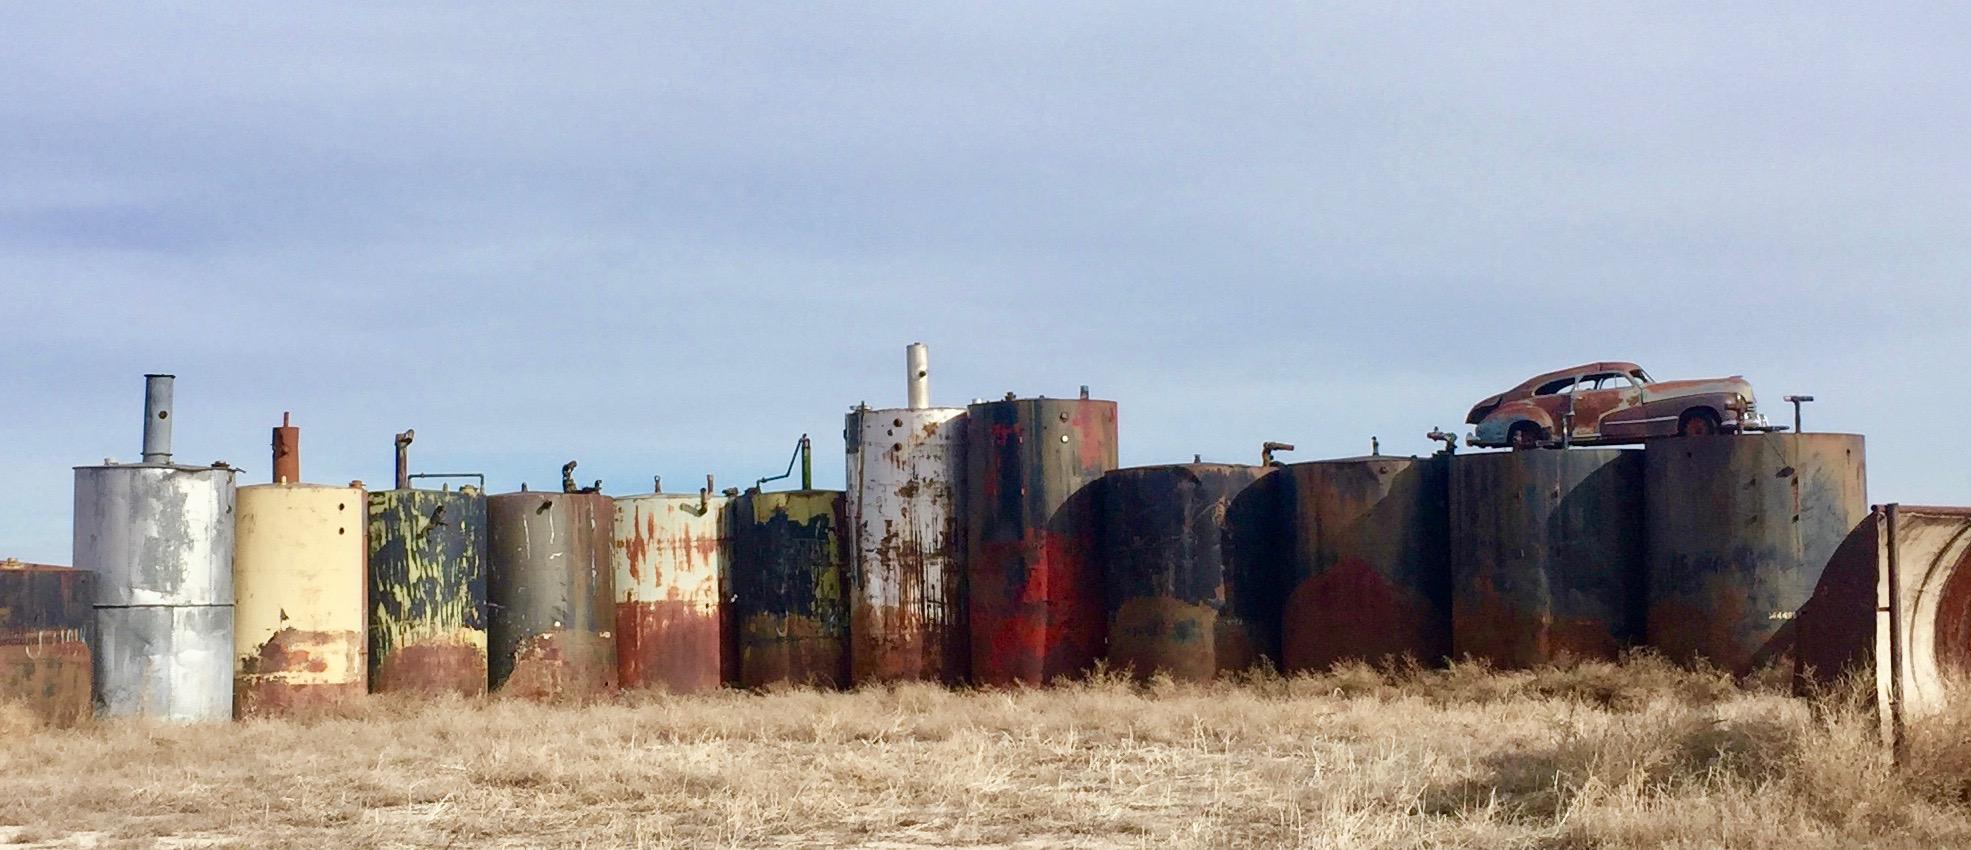 Fuel Fossils , near Wauneta, NE